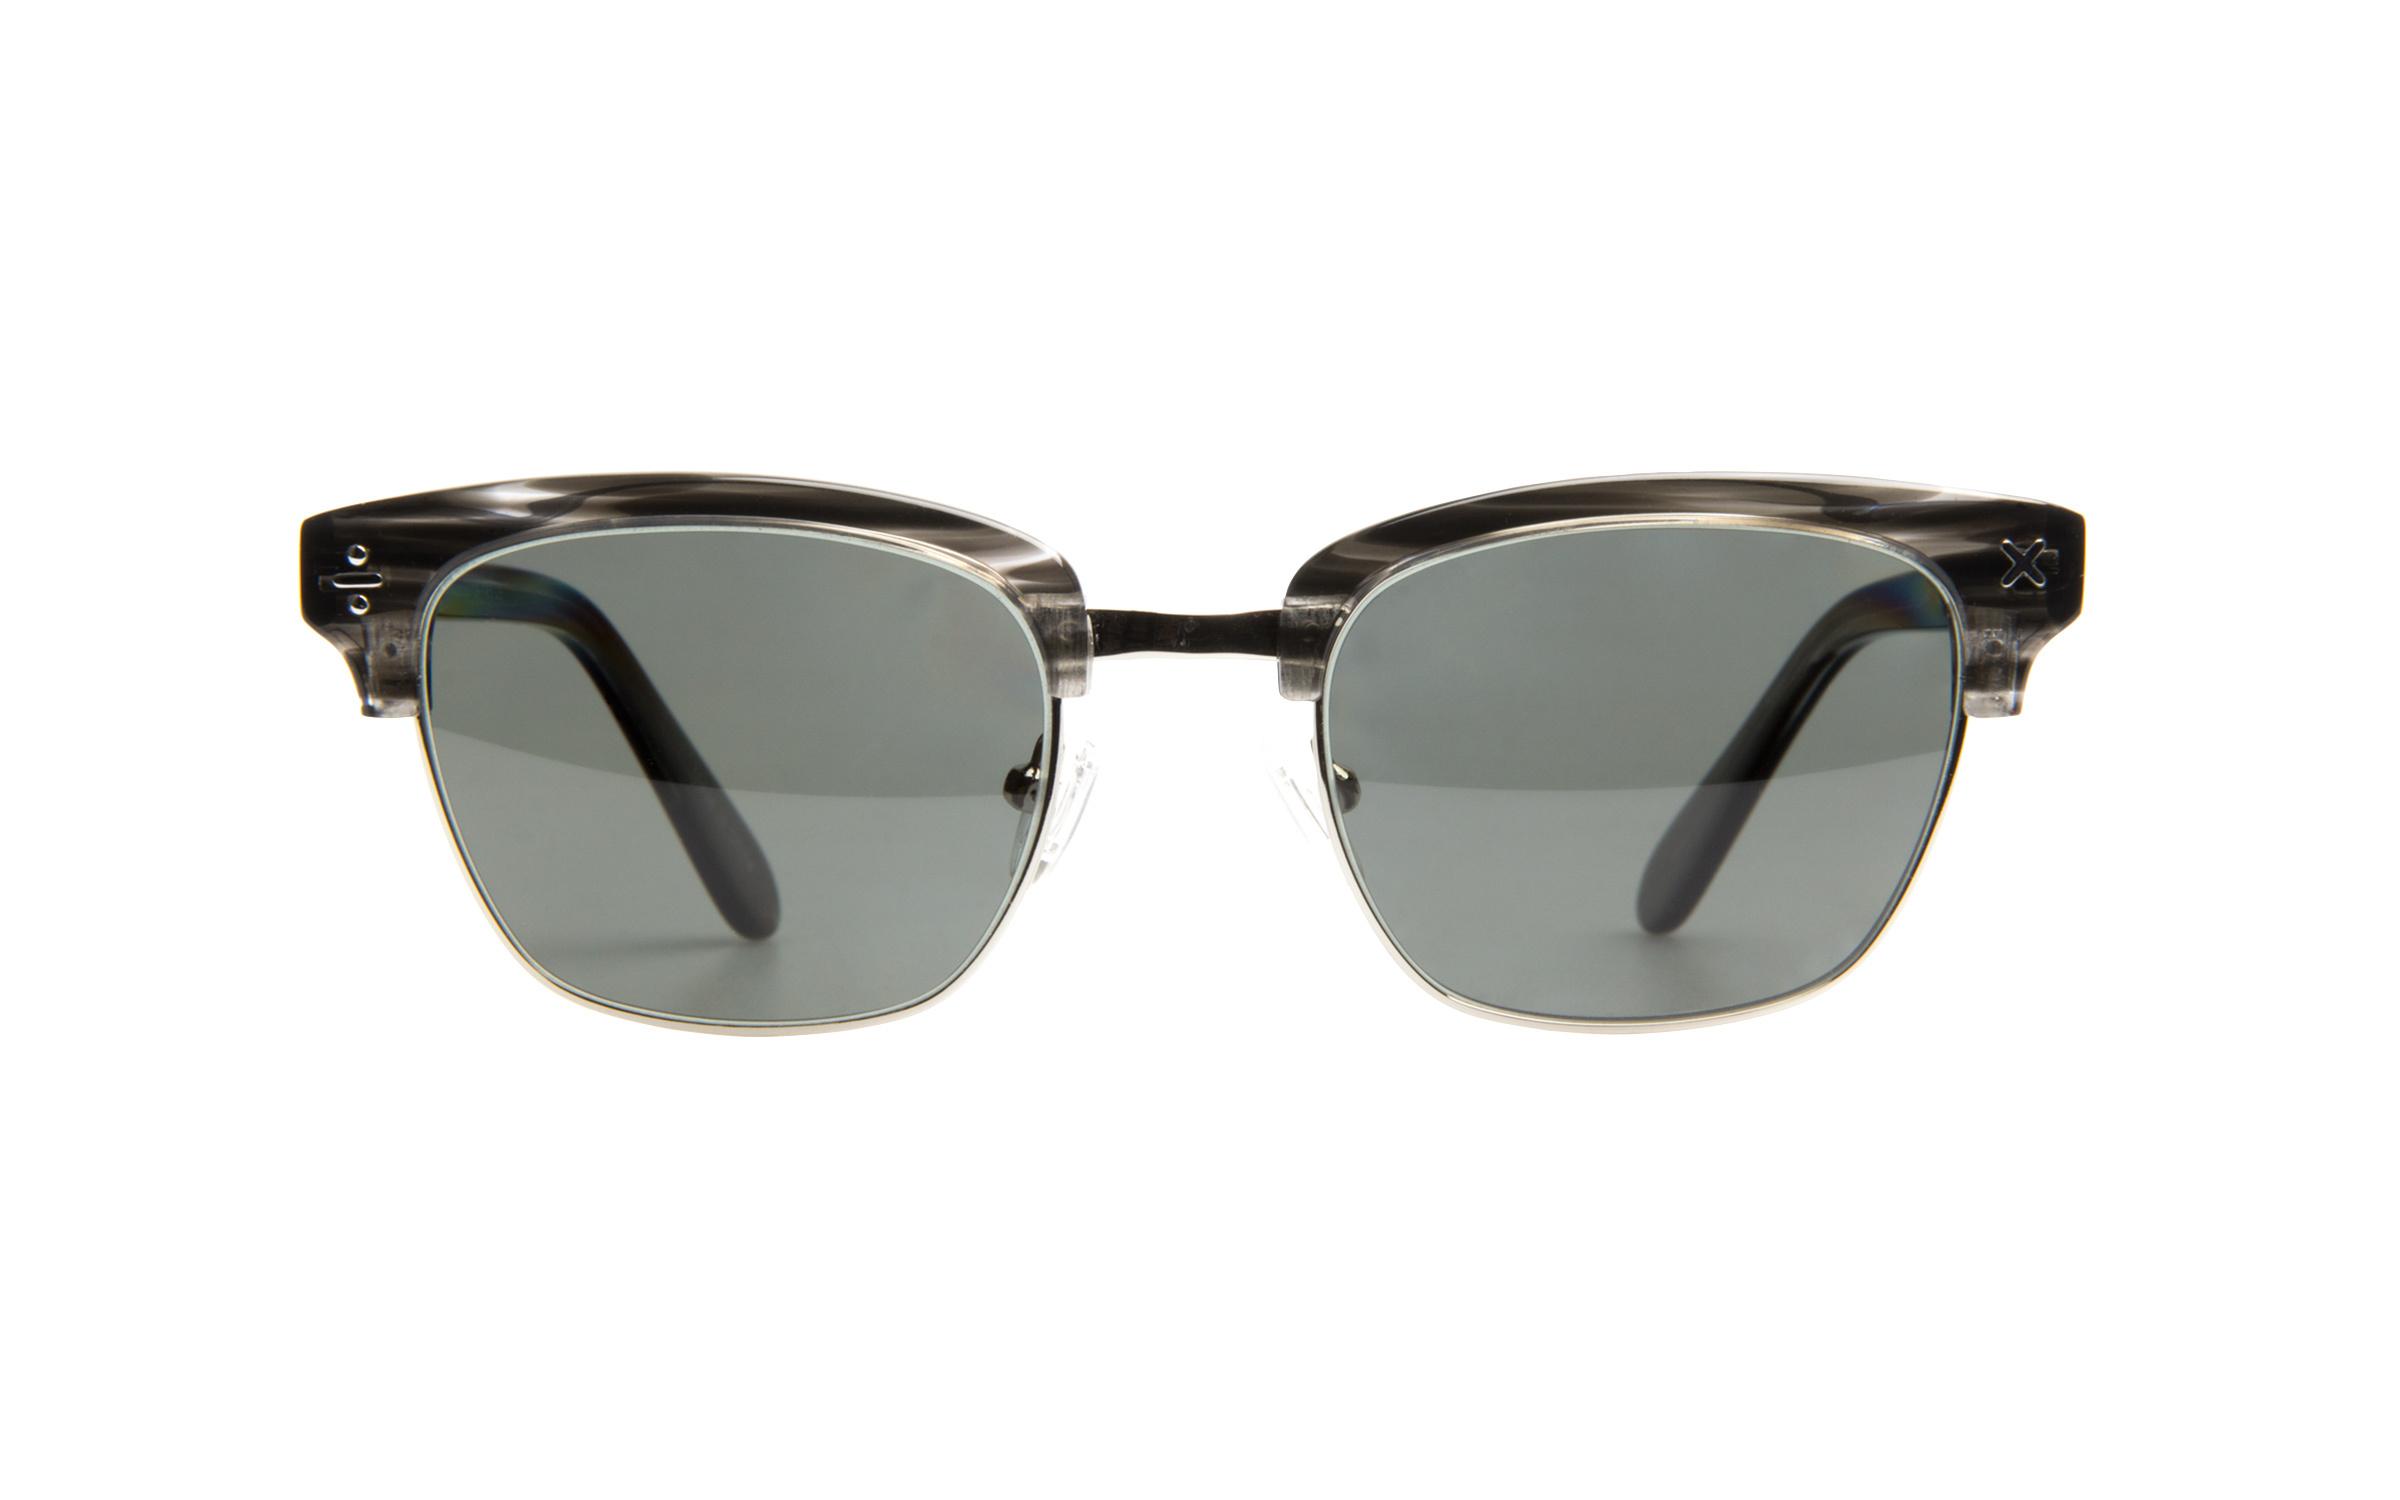 Derek_Cardigan_Sunglasses_Clubmaster_Grey_Acetate_Online_Coastal